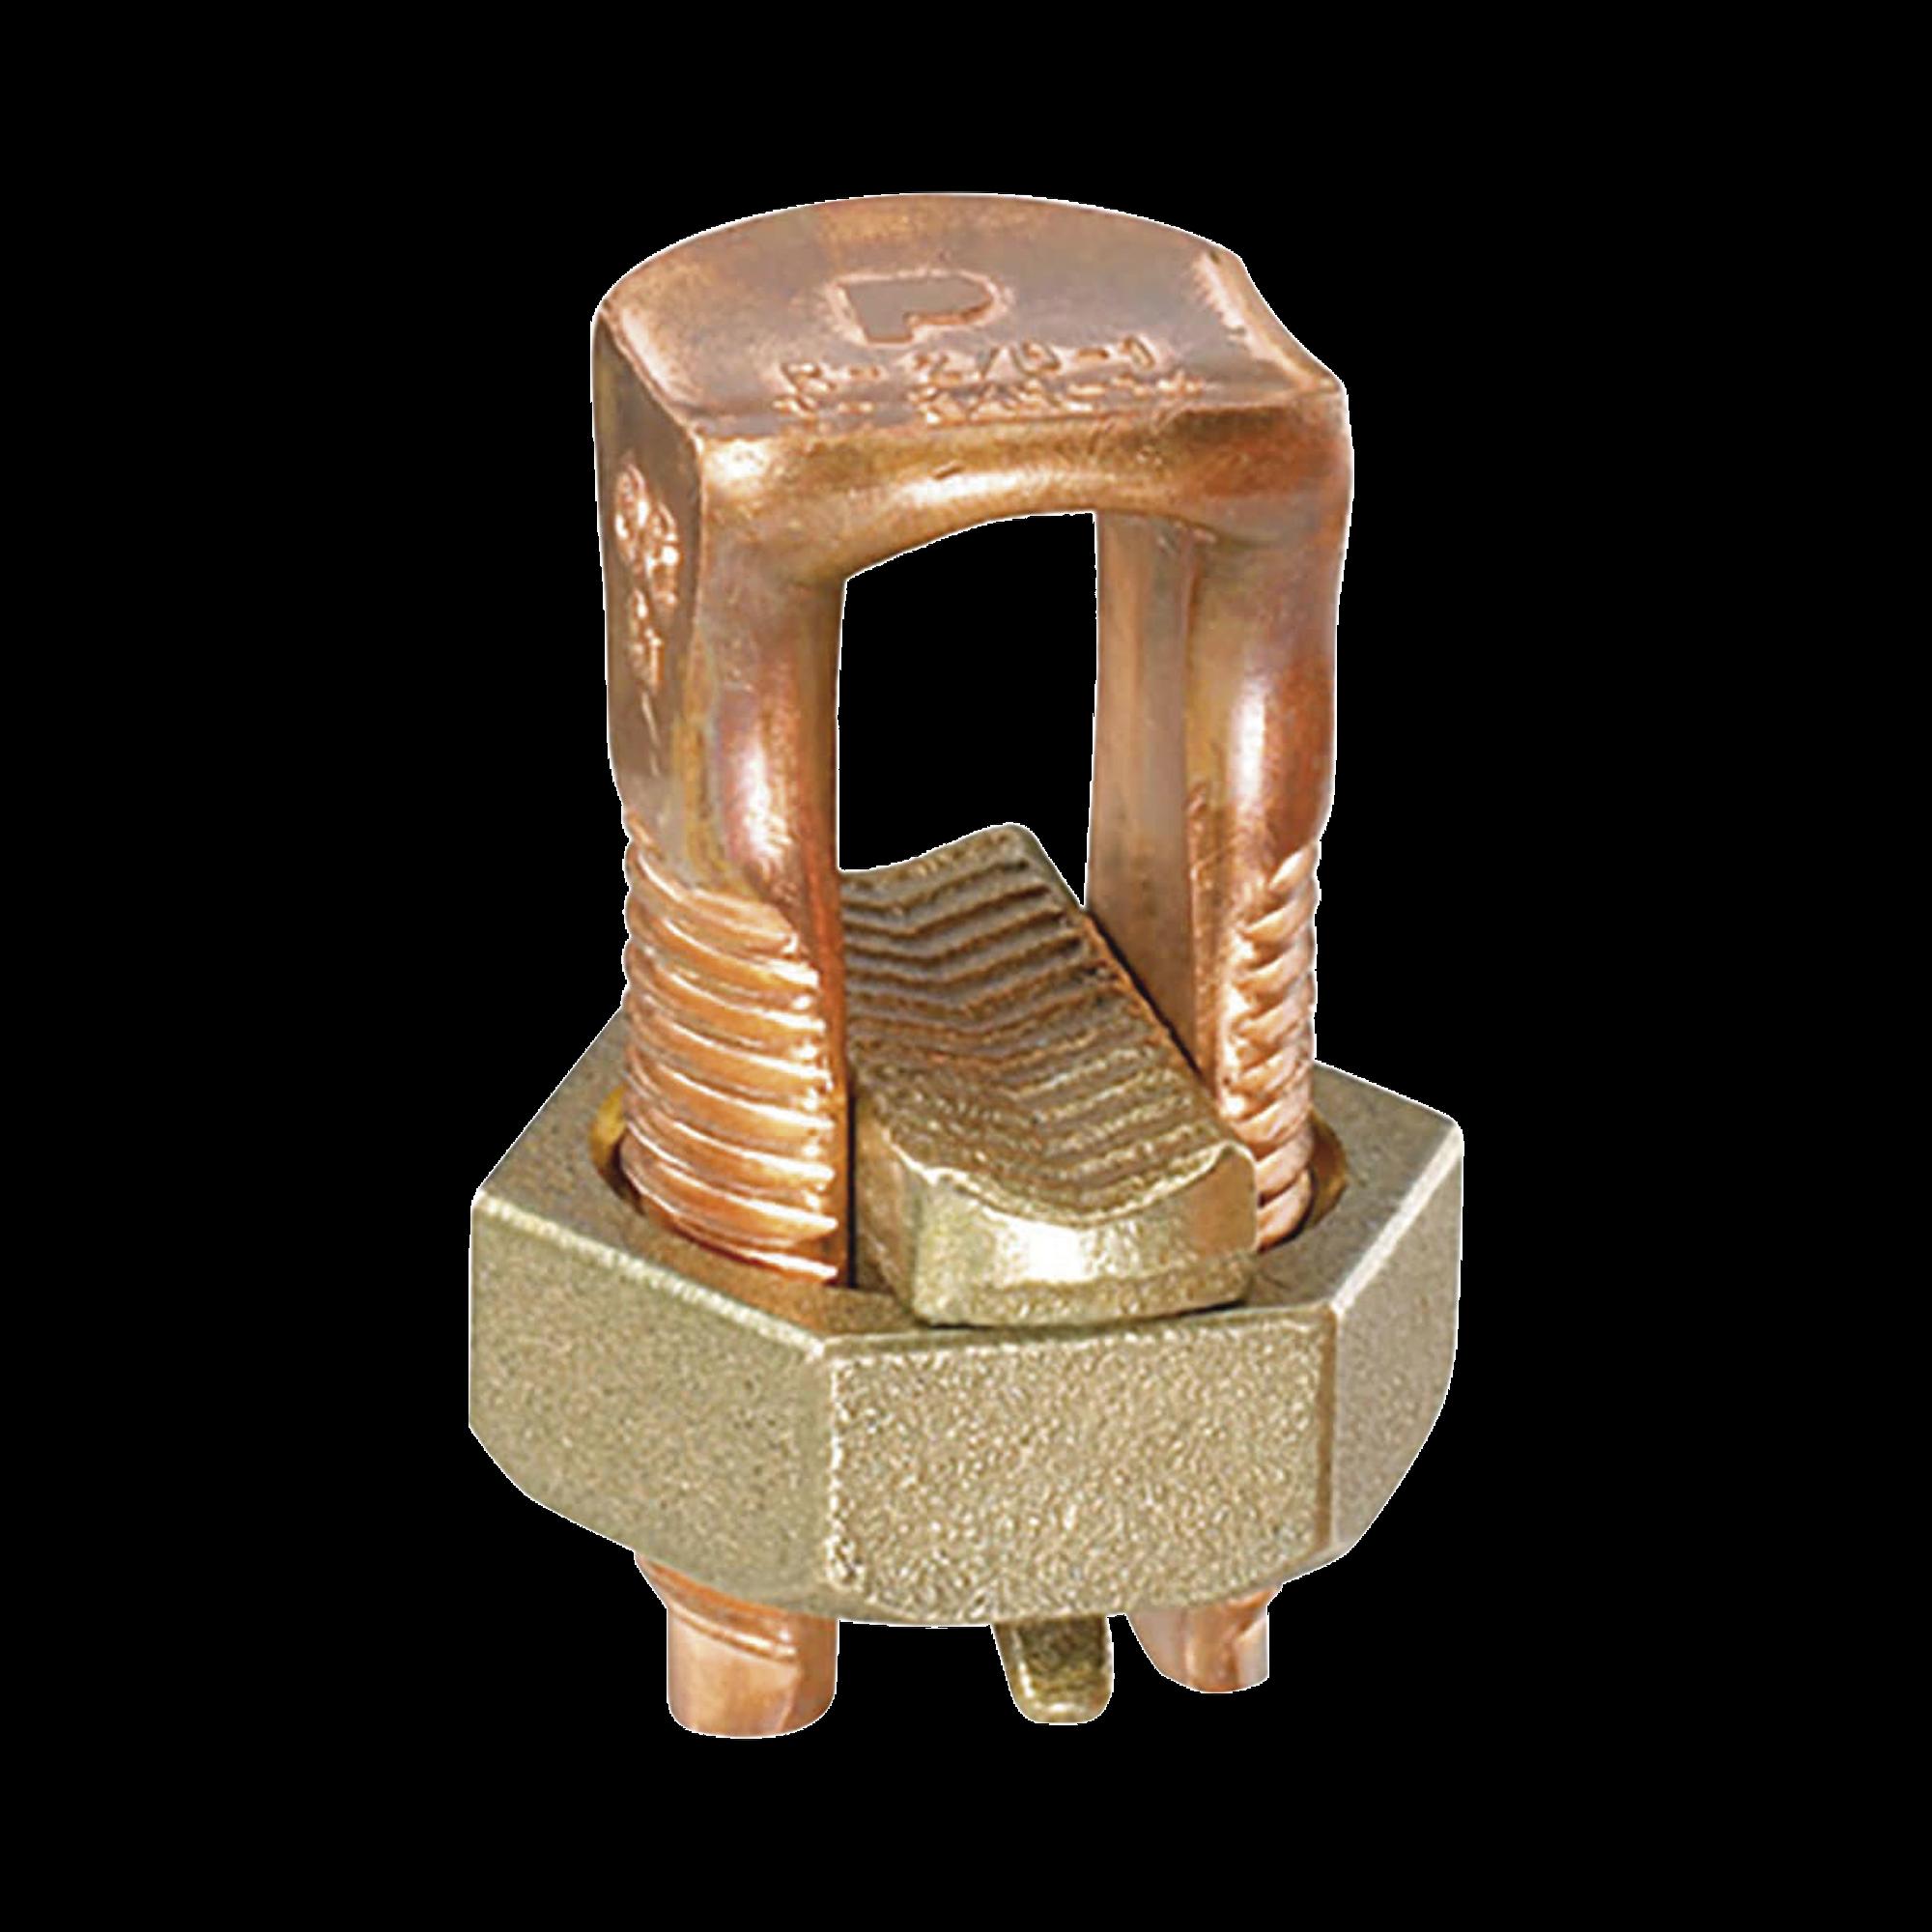 Conector Mecánico de Puesta a Tierra, de Cobre, Para Cables de Calibre 2 a 2/0 AWG